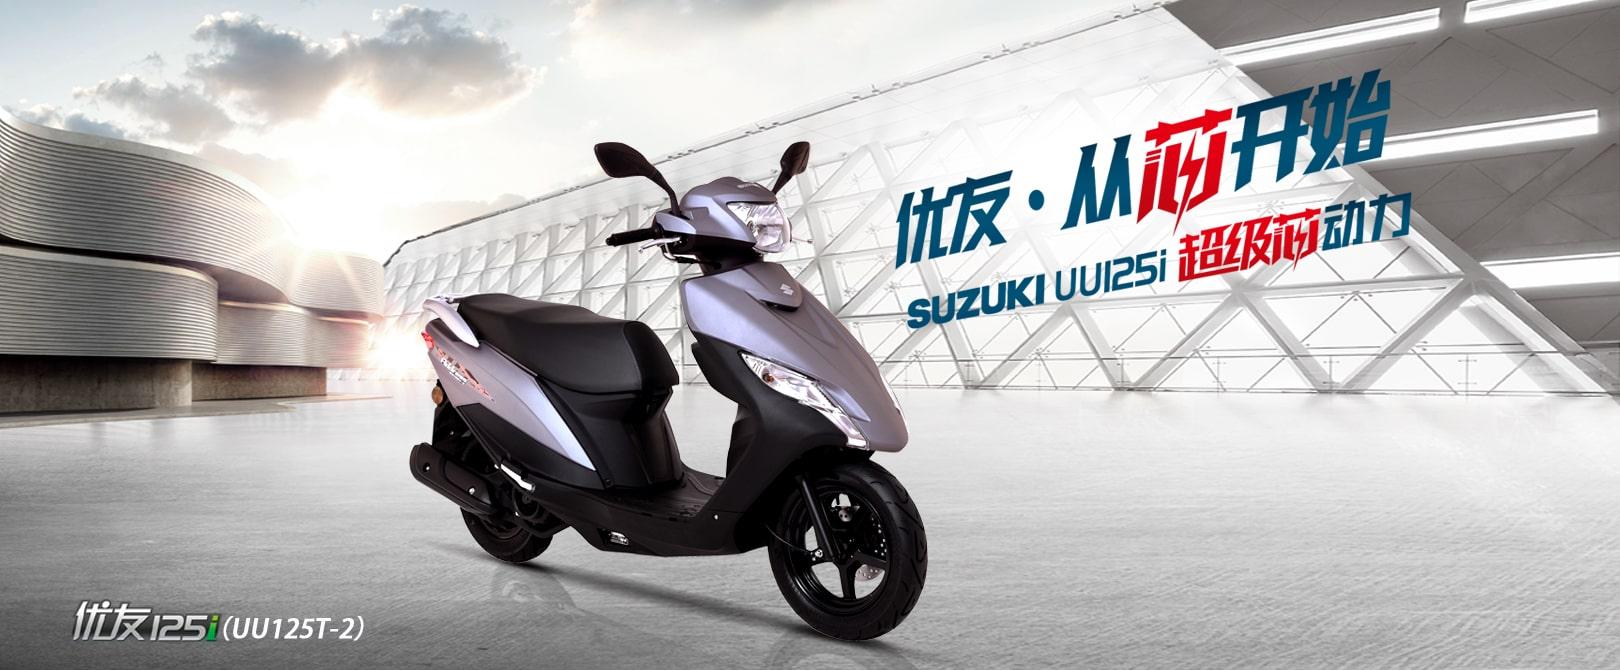 suzuki uu125i 2021